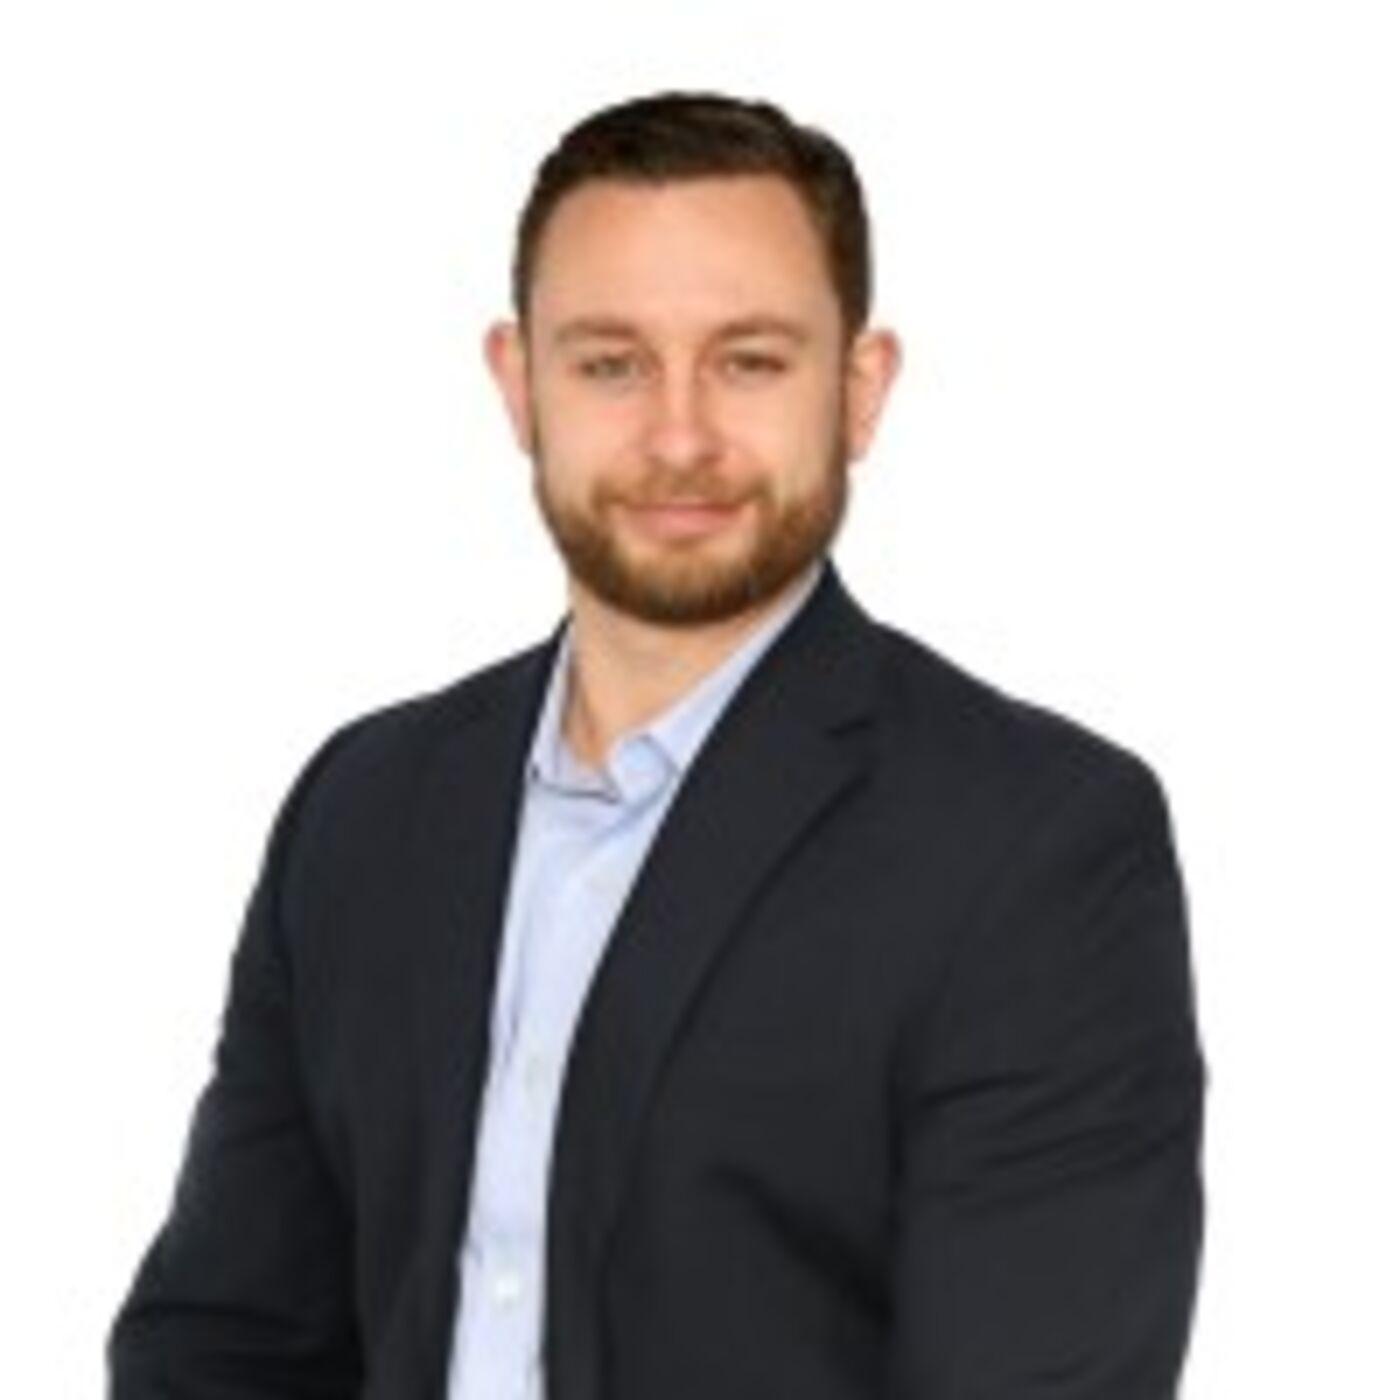 Ben White Interview: Hiring & Recruiting Strategies for Talent Development in 2021